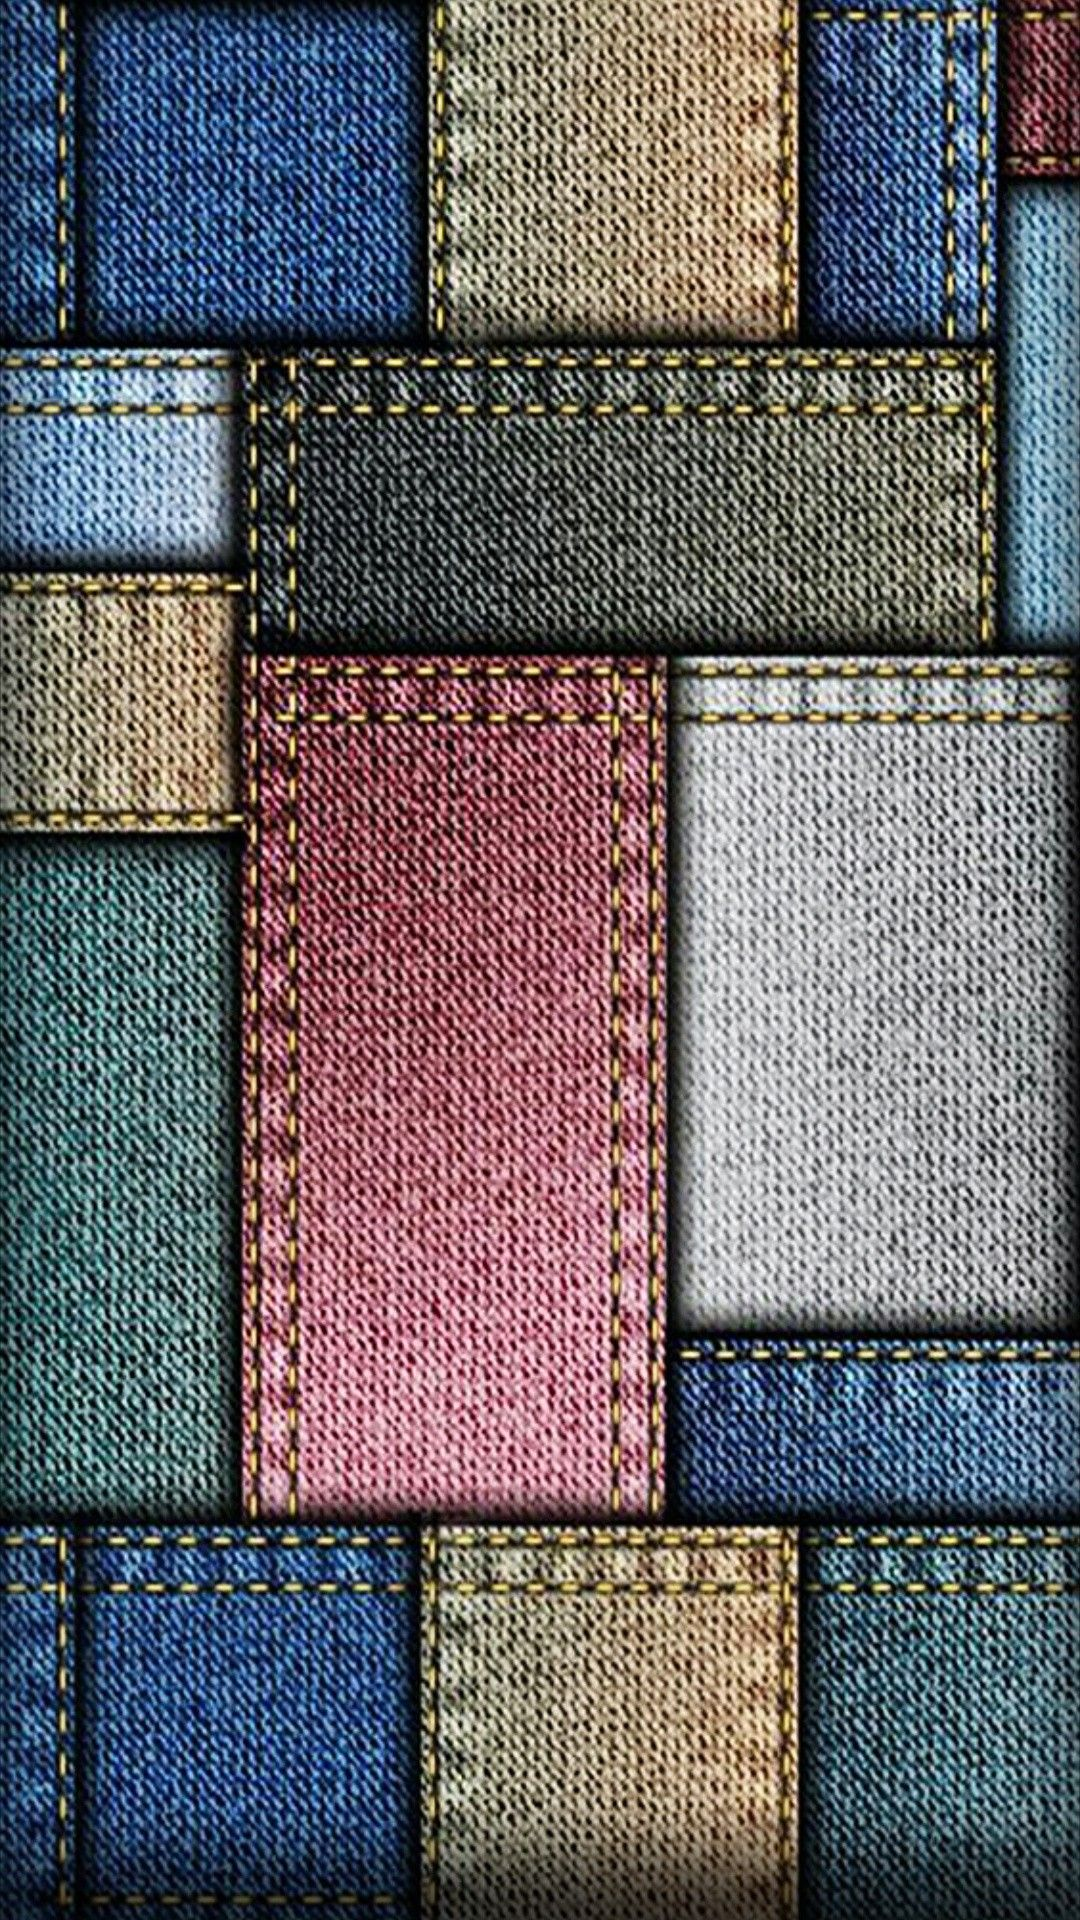 Get Cool Beautiful Phone Wallpaper HD 2020 by setaswall.com